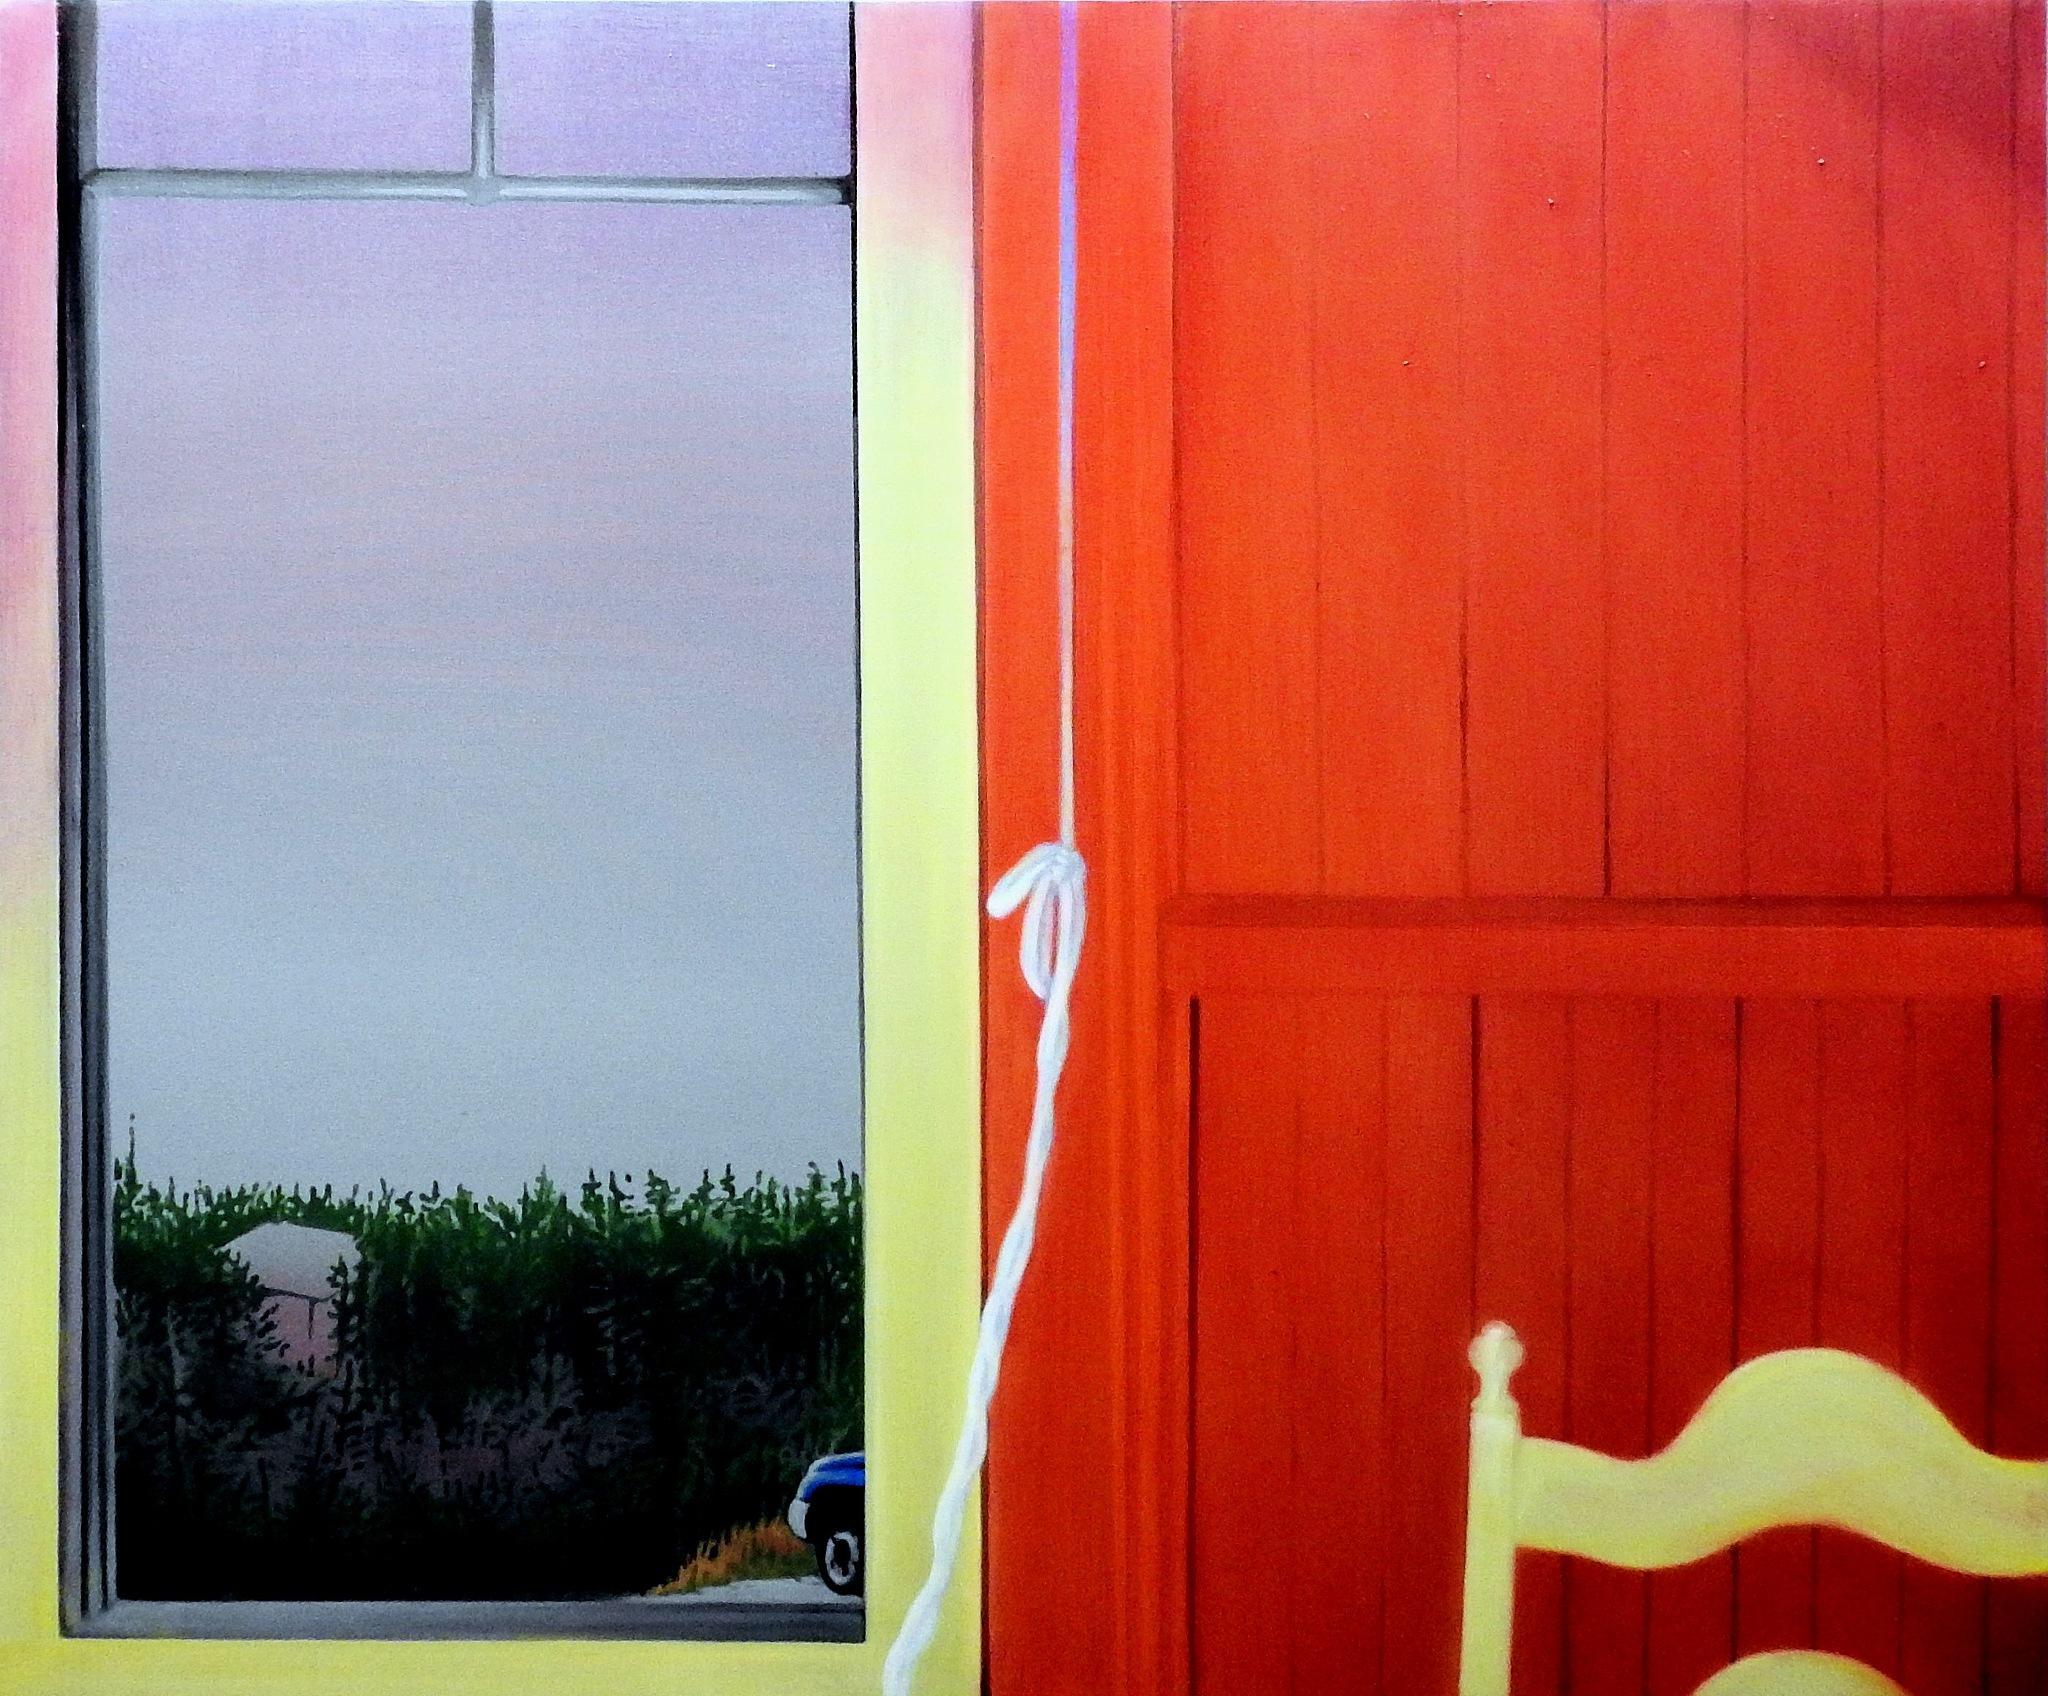 P.A.N. Napoli - Laura Giardino - Out Of Field - 3 by Arnaldo De Lisio